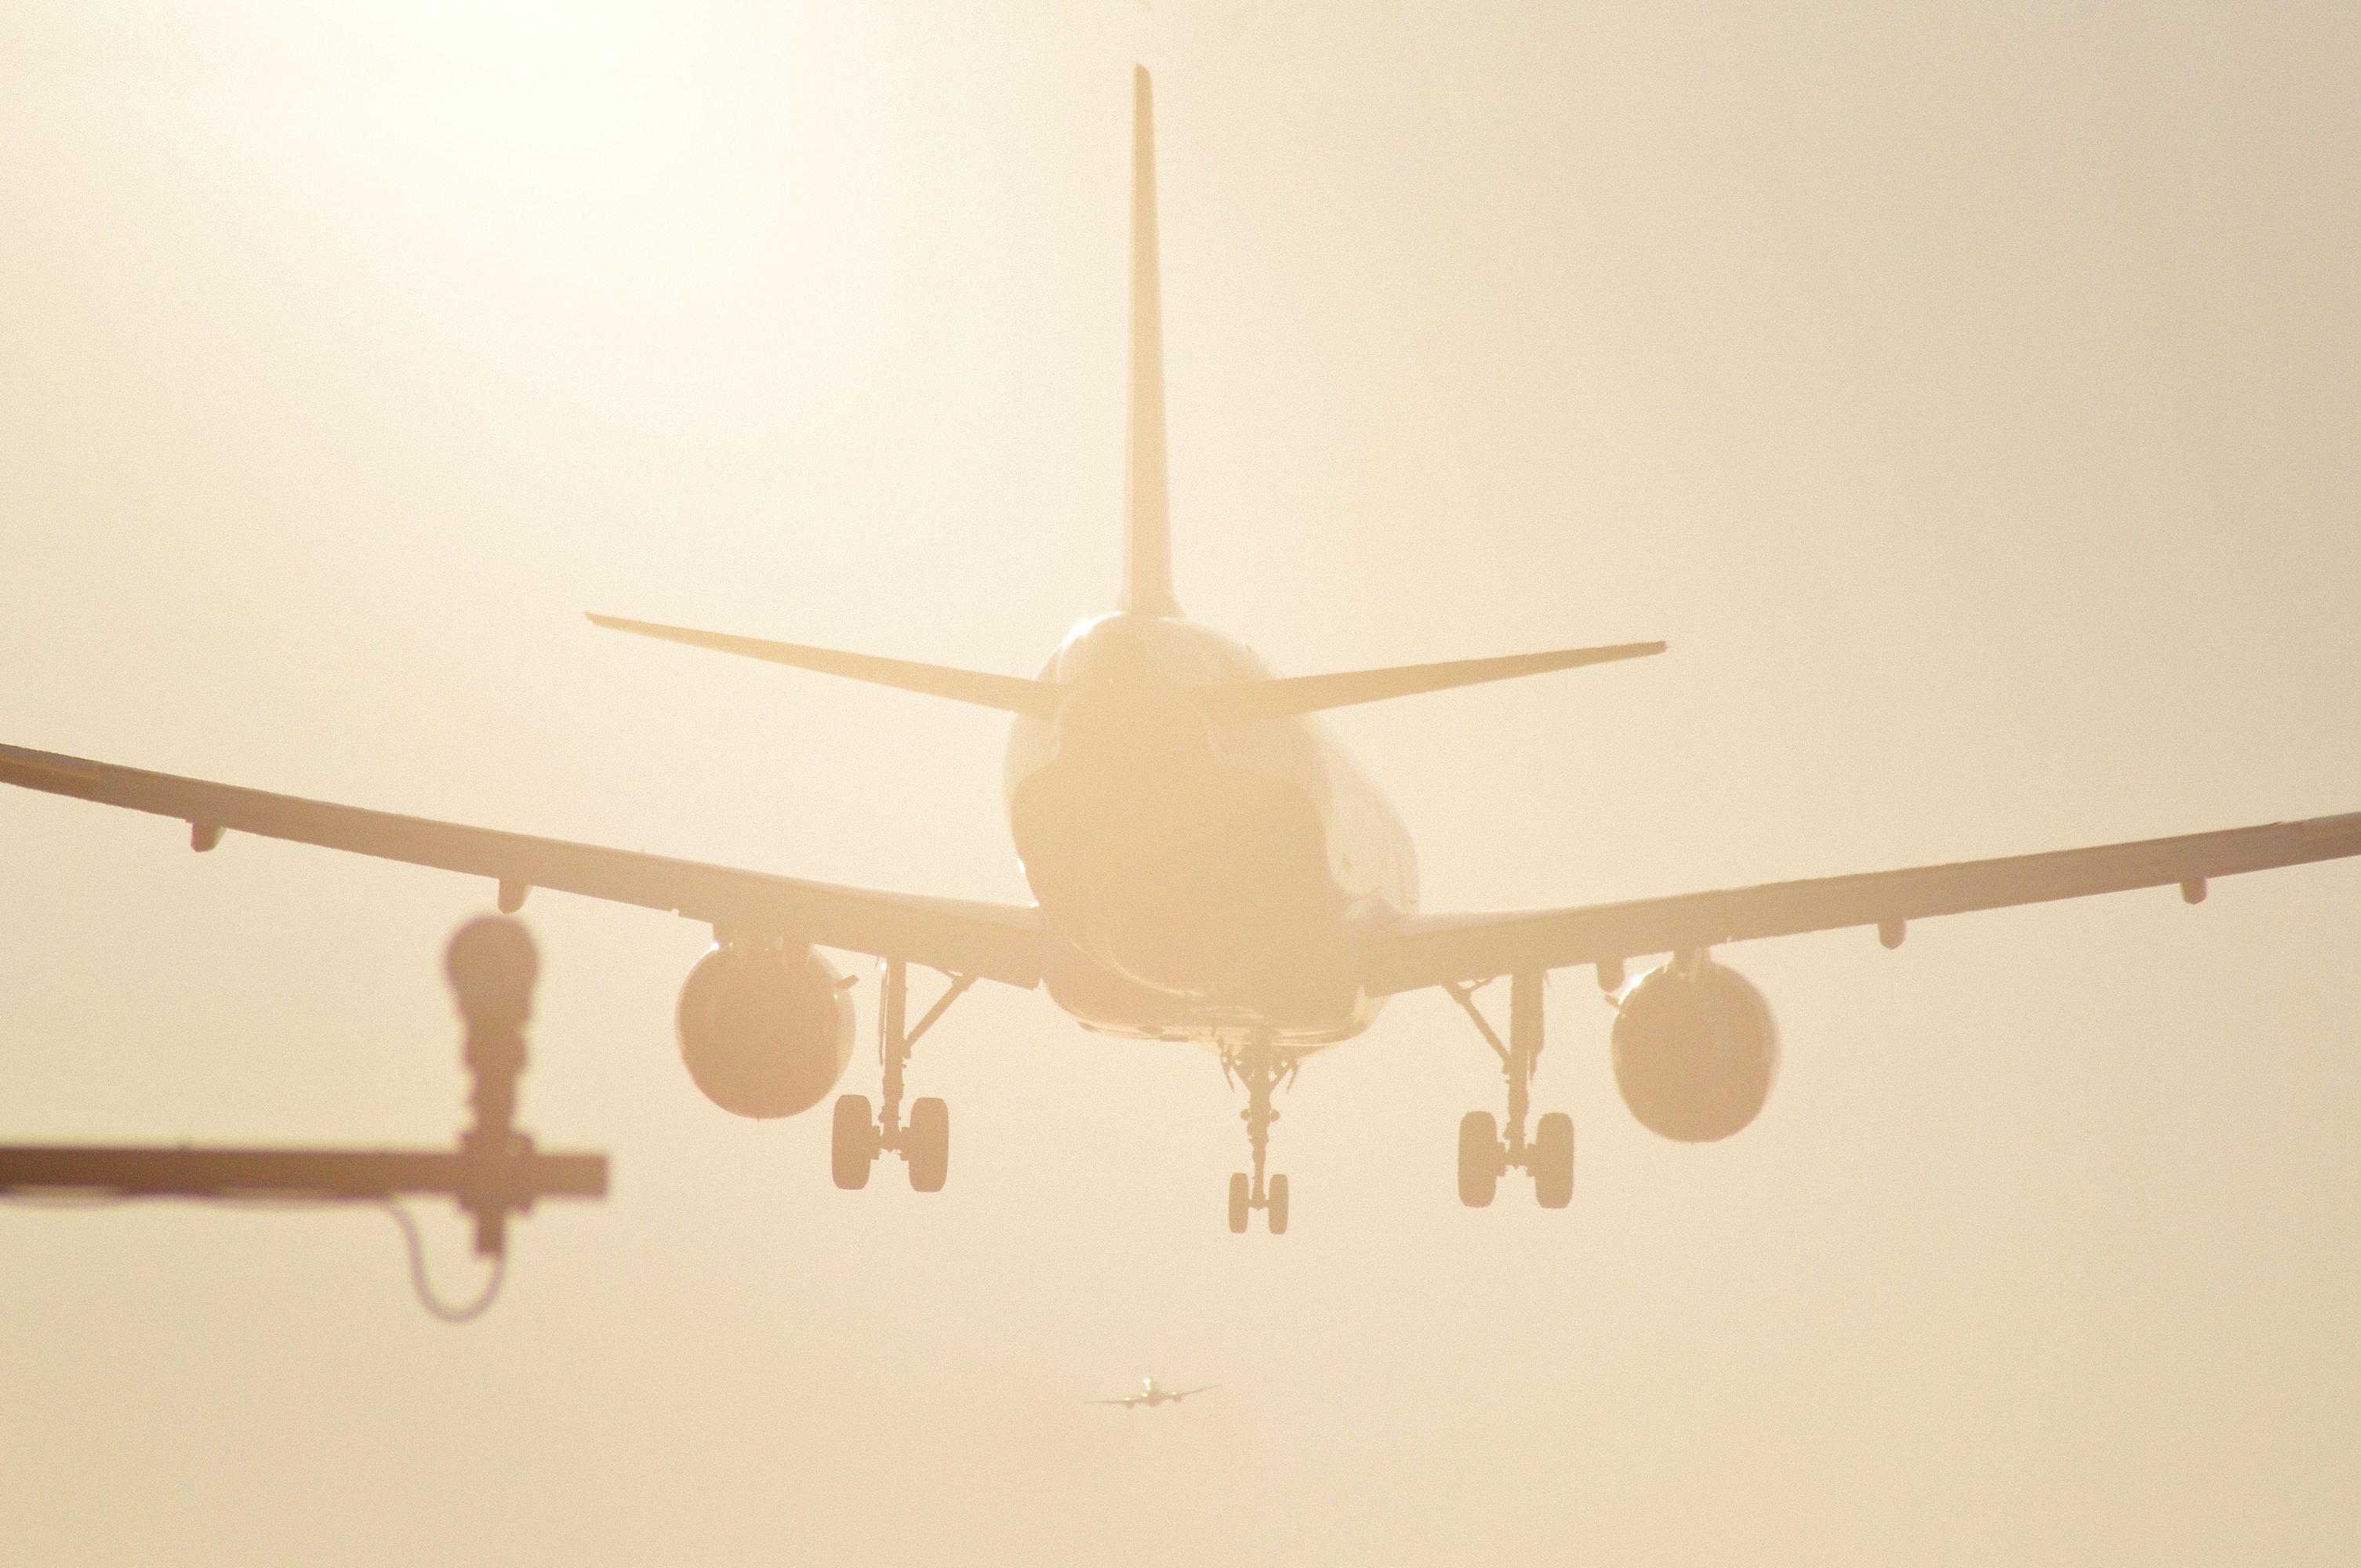 Best Alaska Aircraft photography - Airplane photography - Alaskafoto